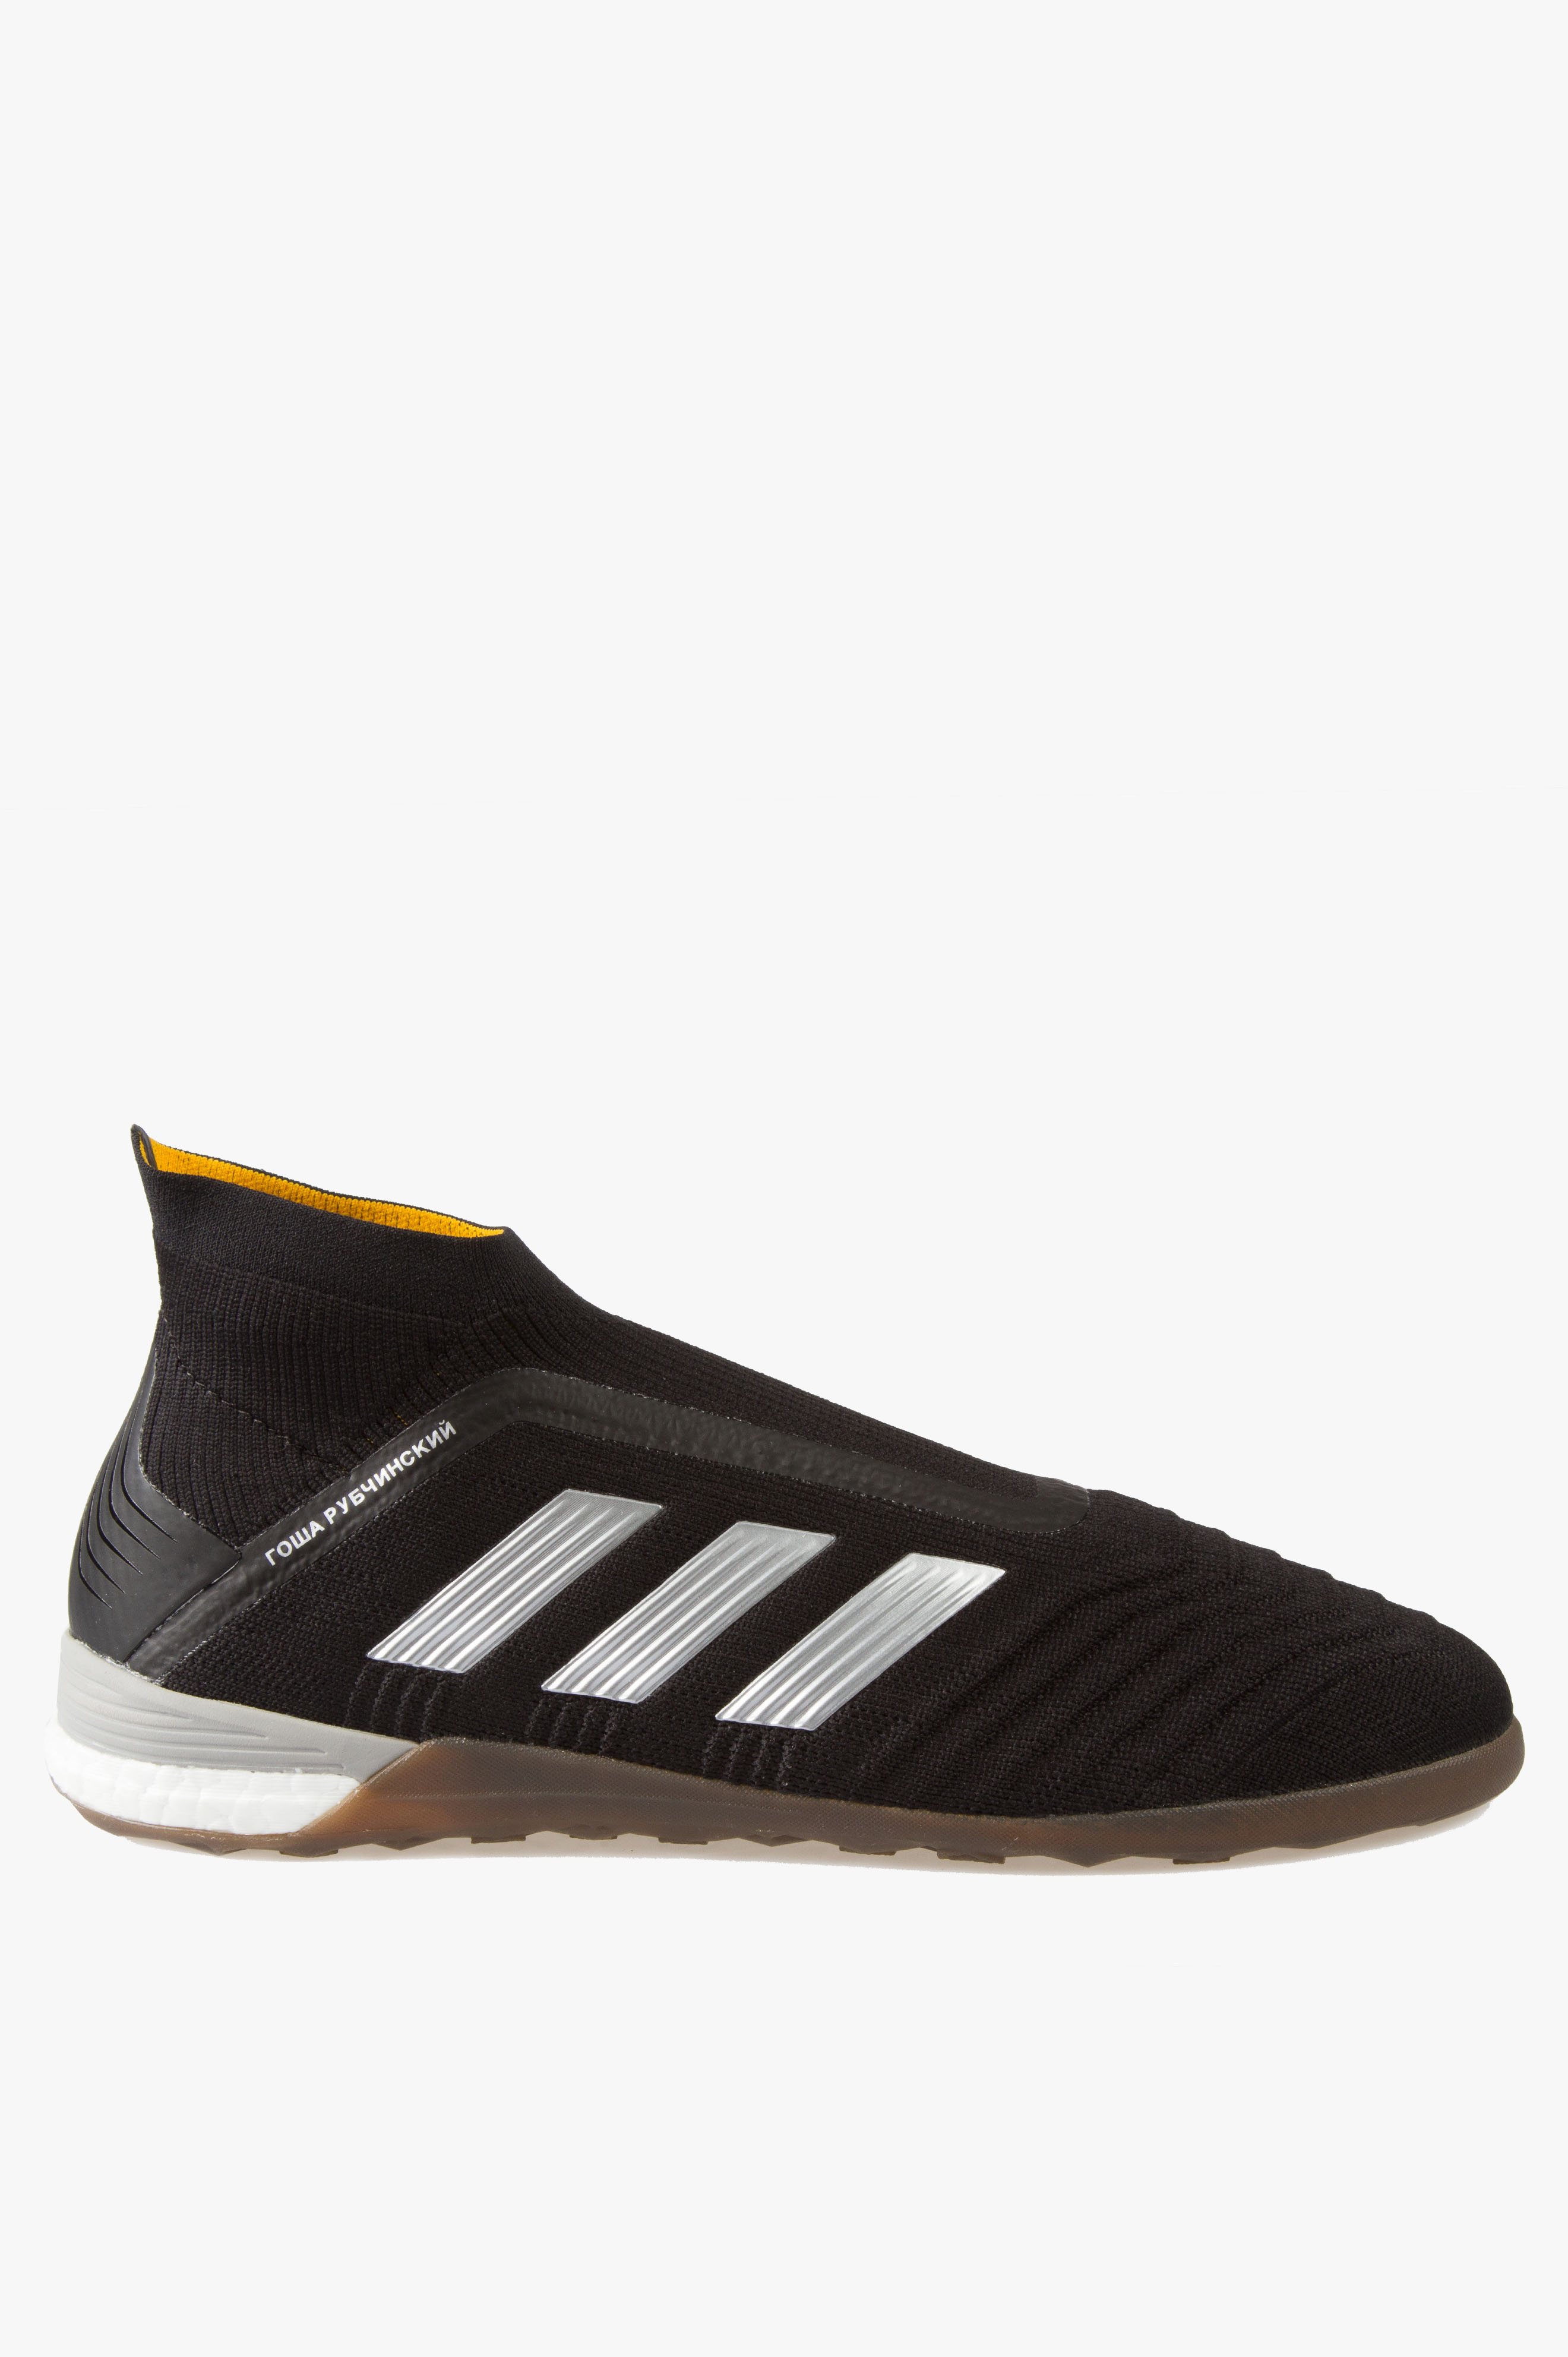 x Adidas Predator Sneaker Black